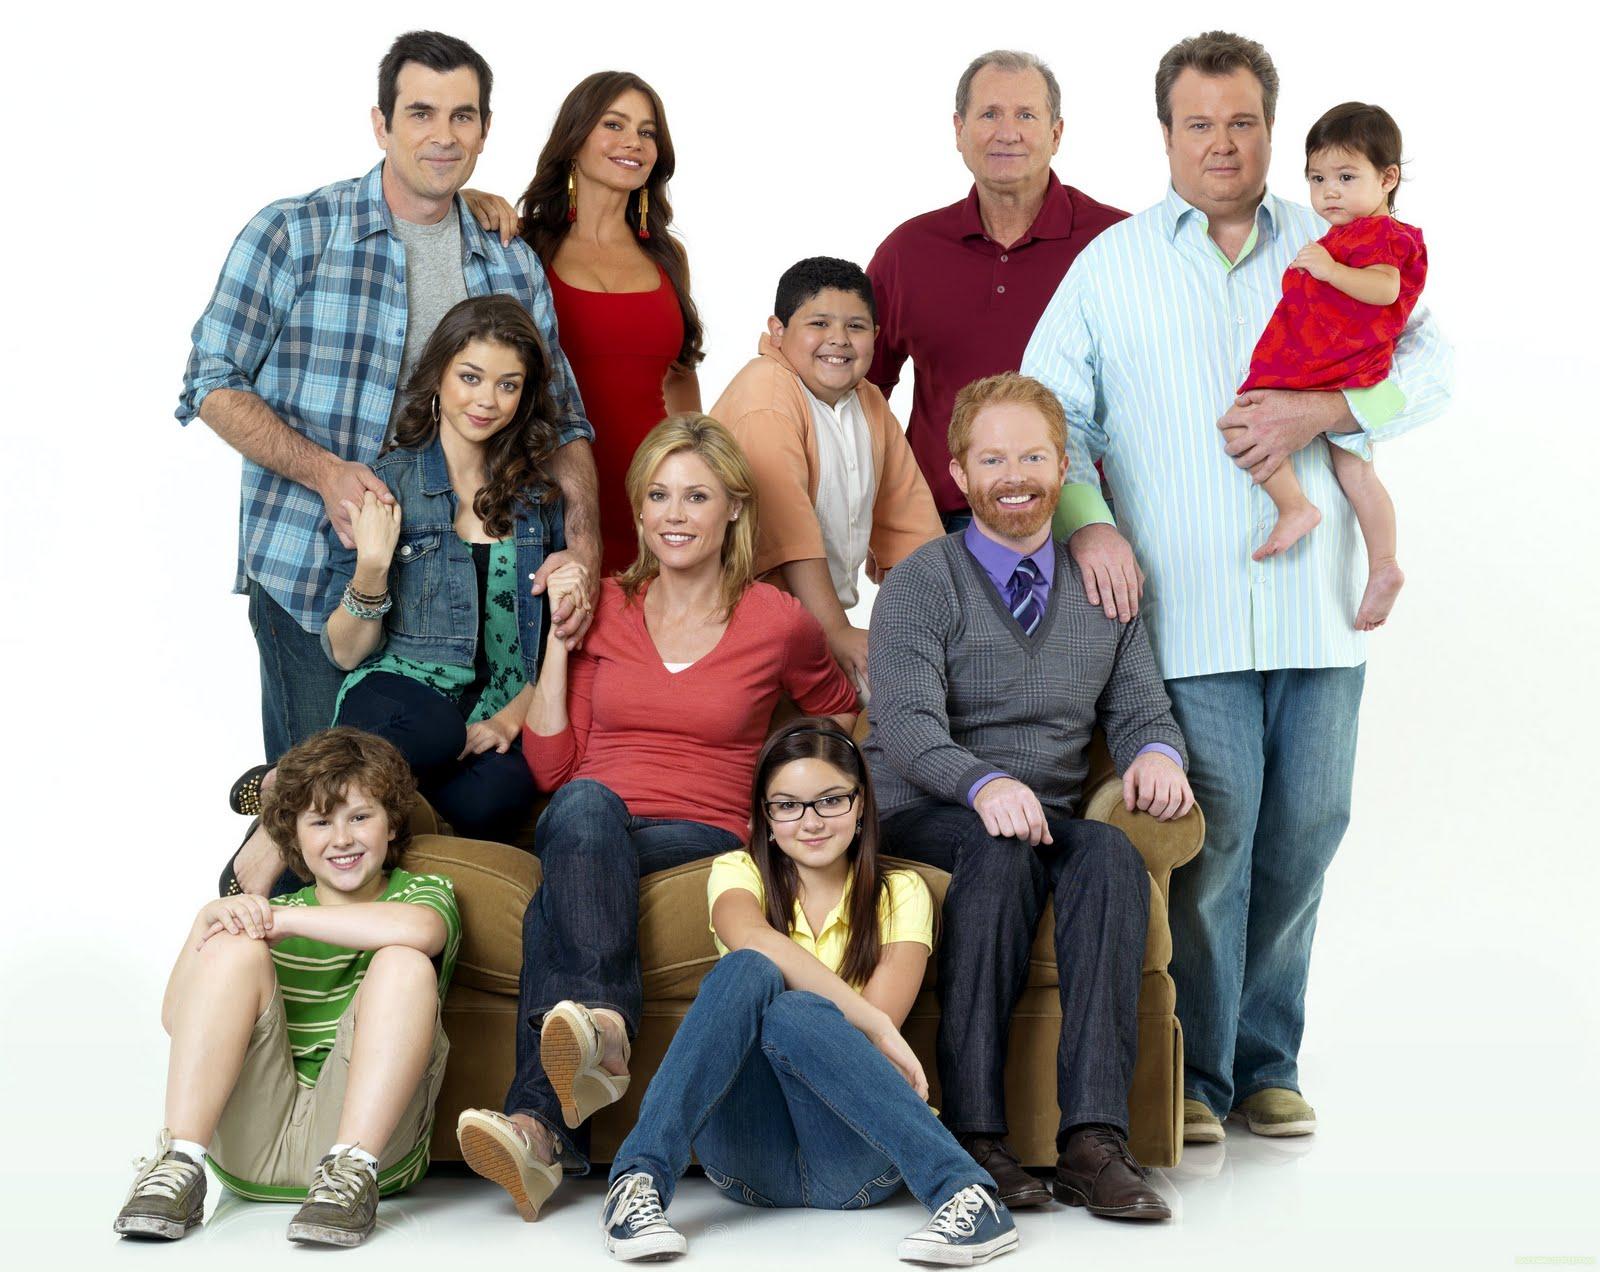 Watch The Modern Family Season 2 Episode 12